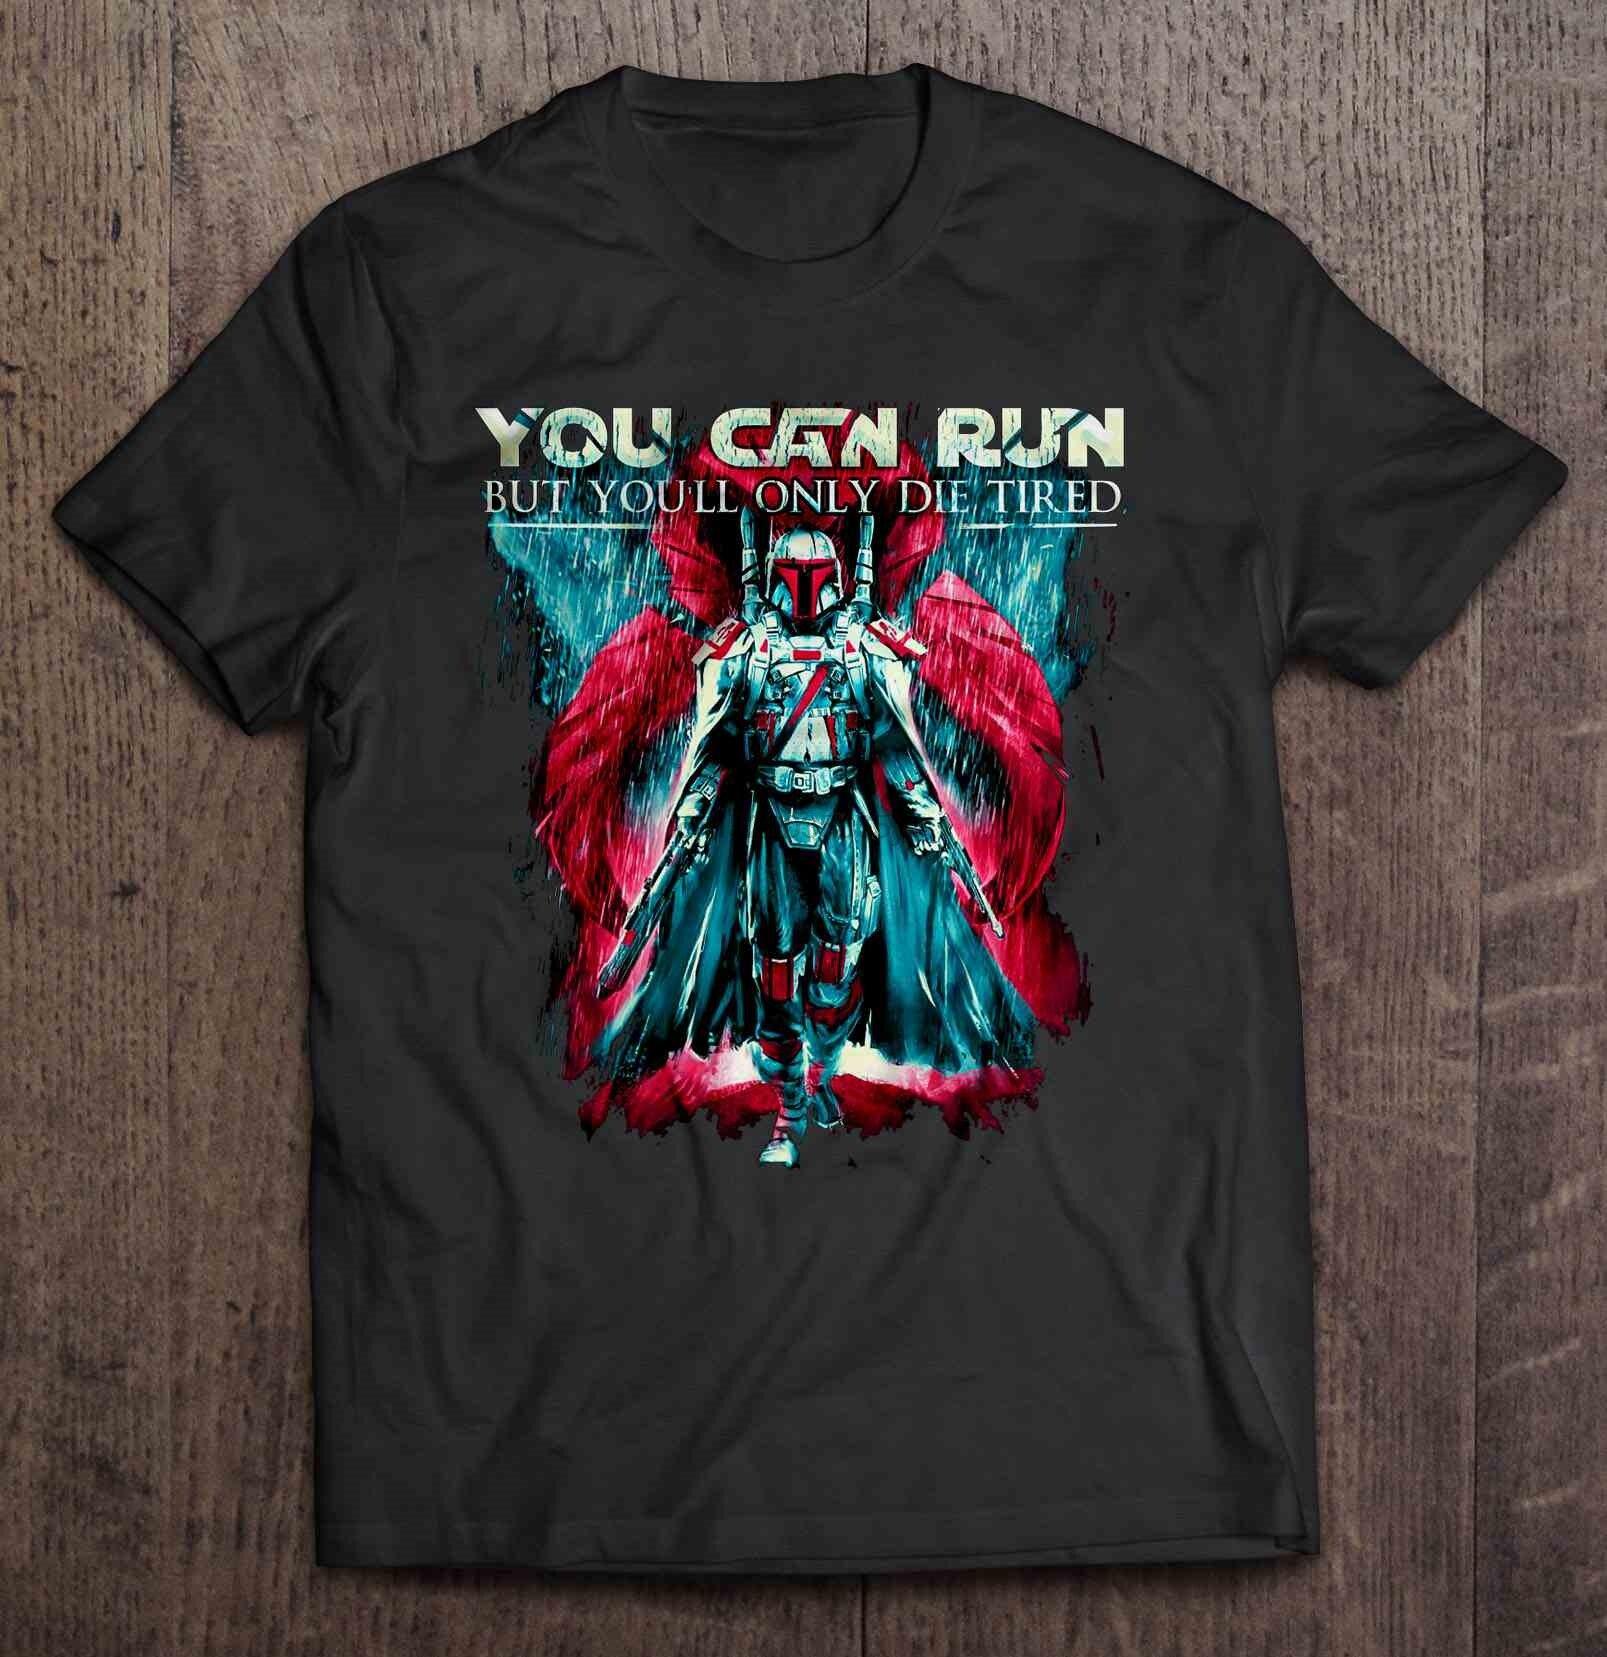 Camiseta para hombre, puedes correr, pero solo Die Tired, camiseta para mujer Boba Fett